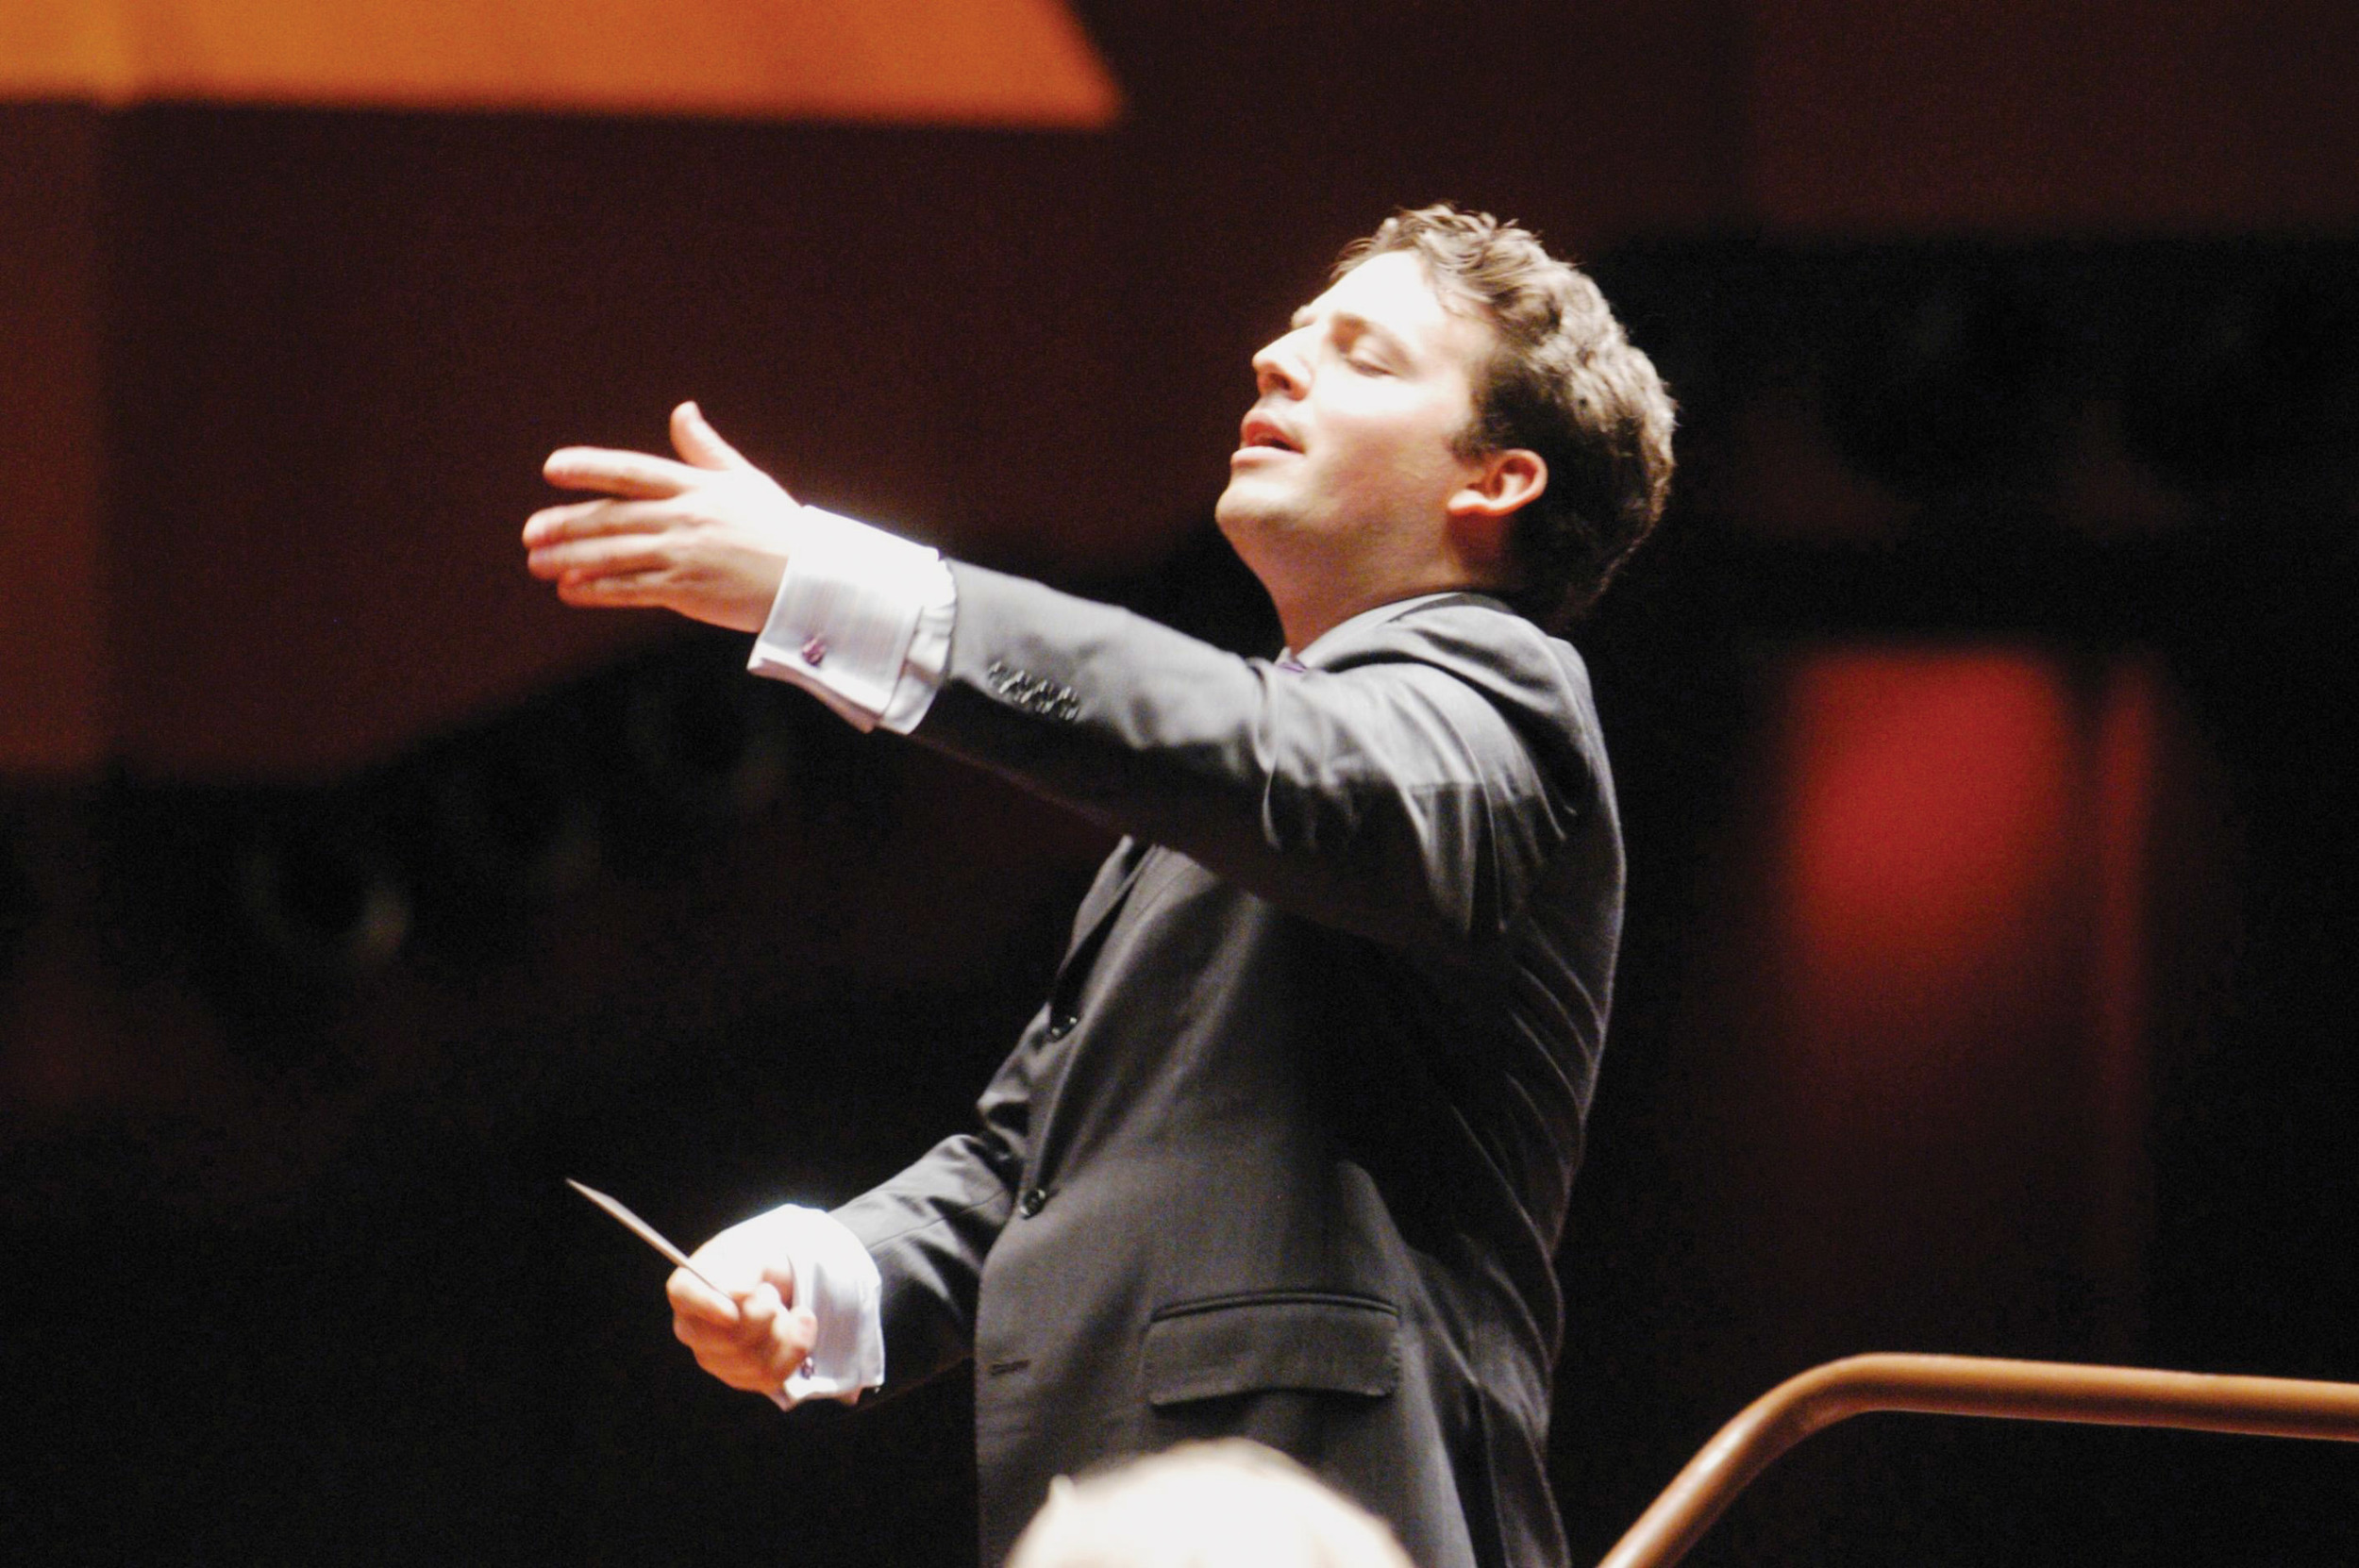 Conductor James Gaffigan